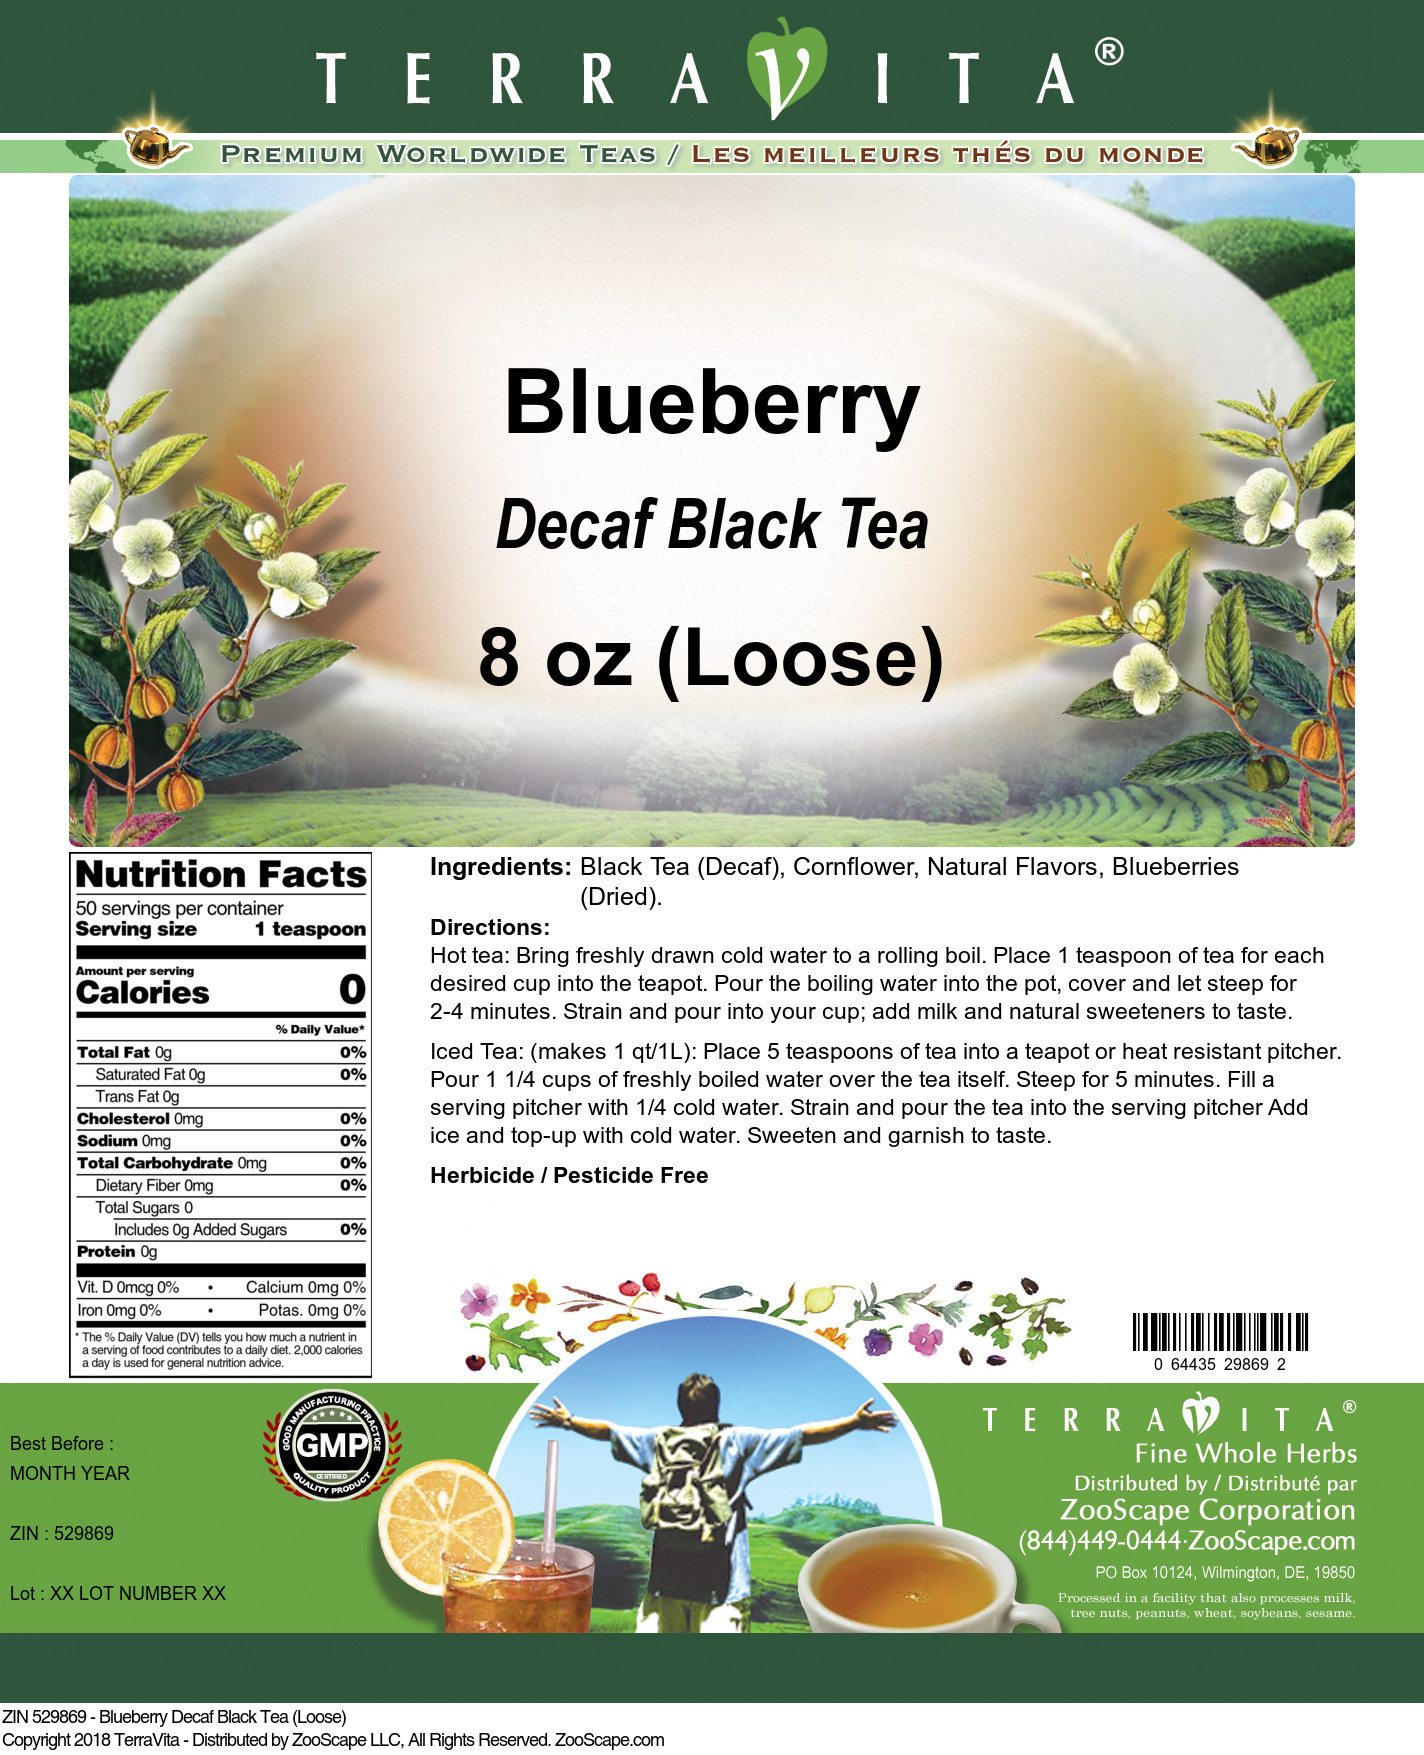 Blueberry Decaf Black Tea (Loose)